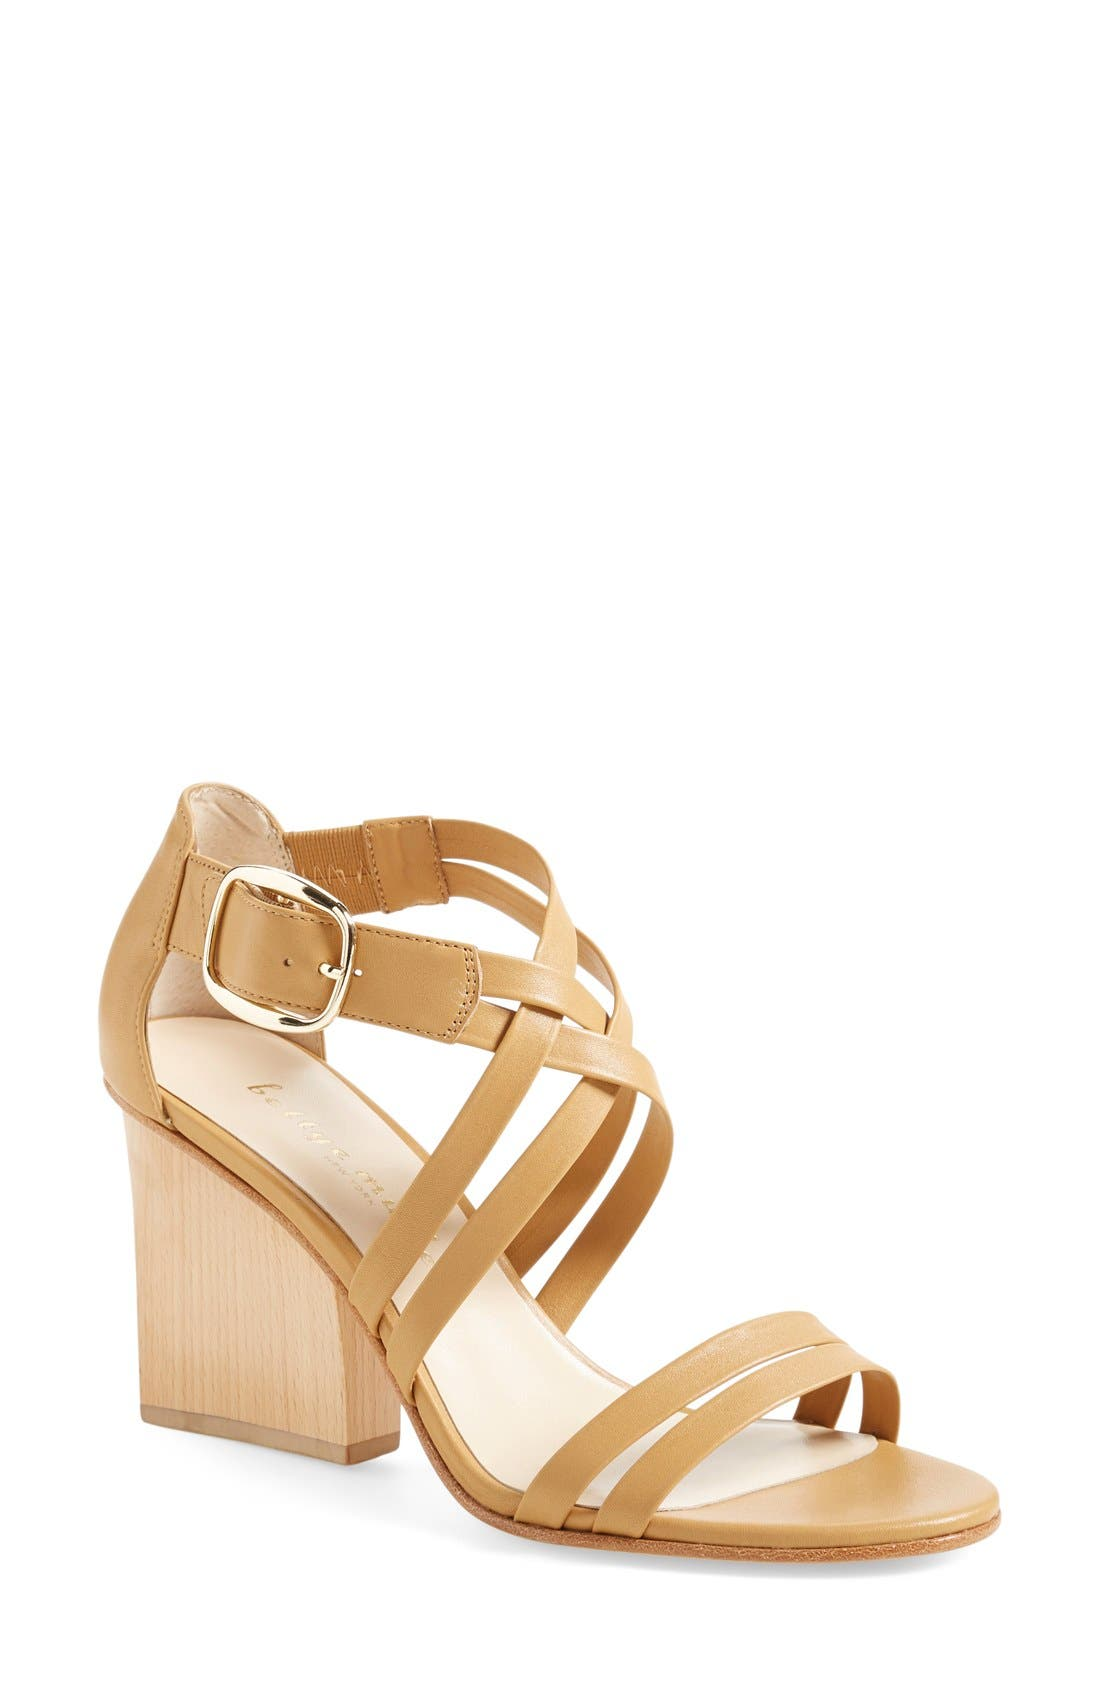 Alternate Image 1 Selected - Bettye Muller 'Cubana' Sandal (Women)